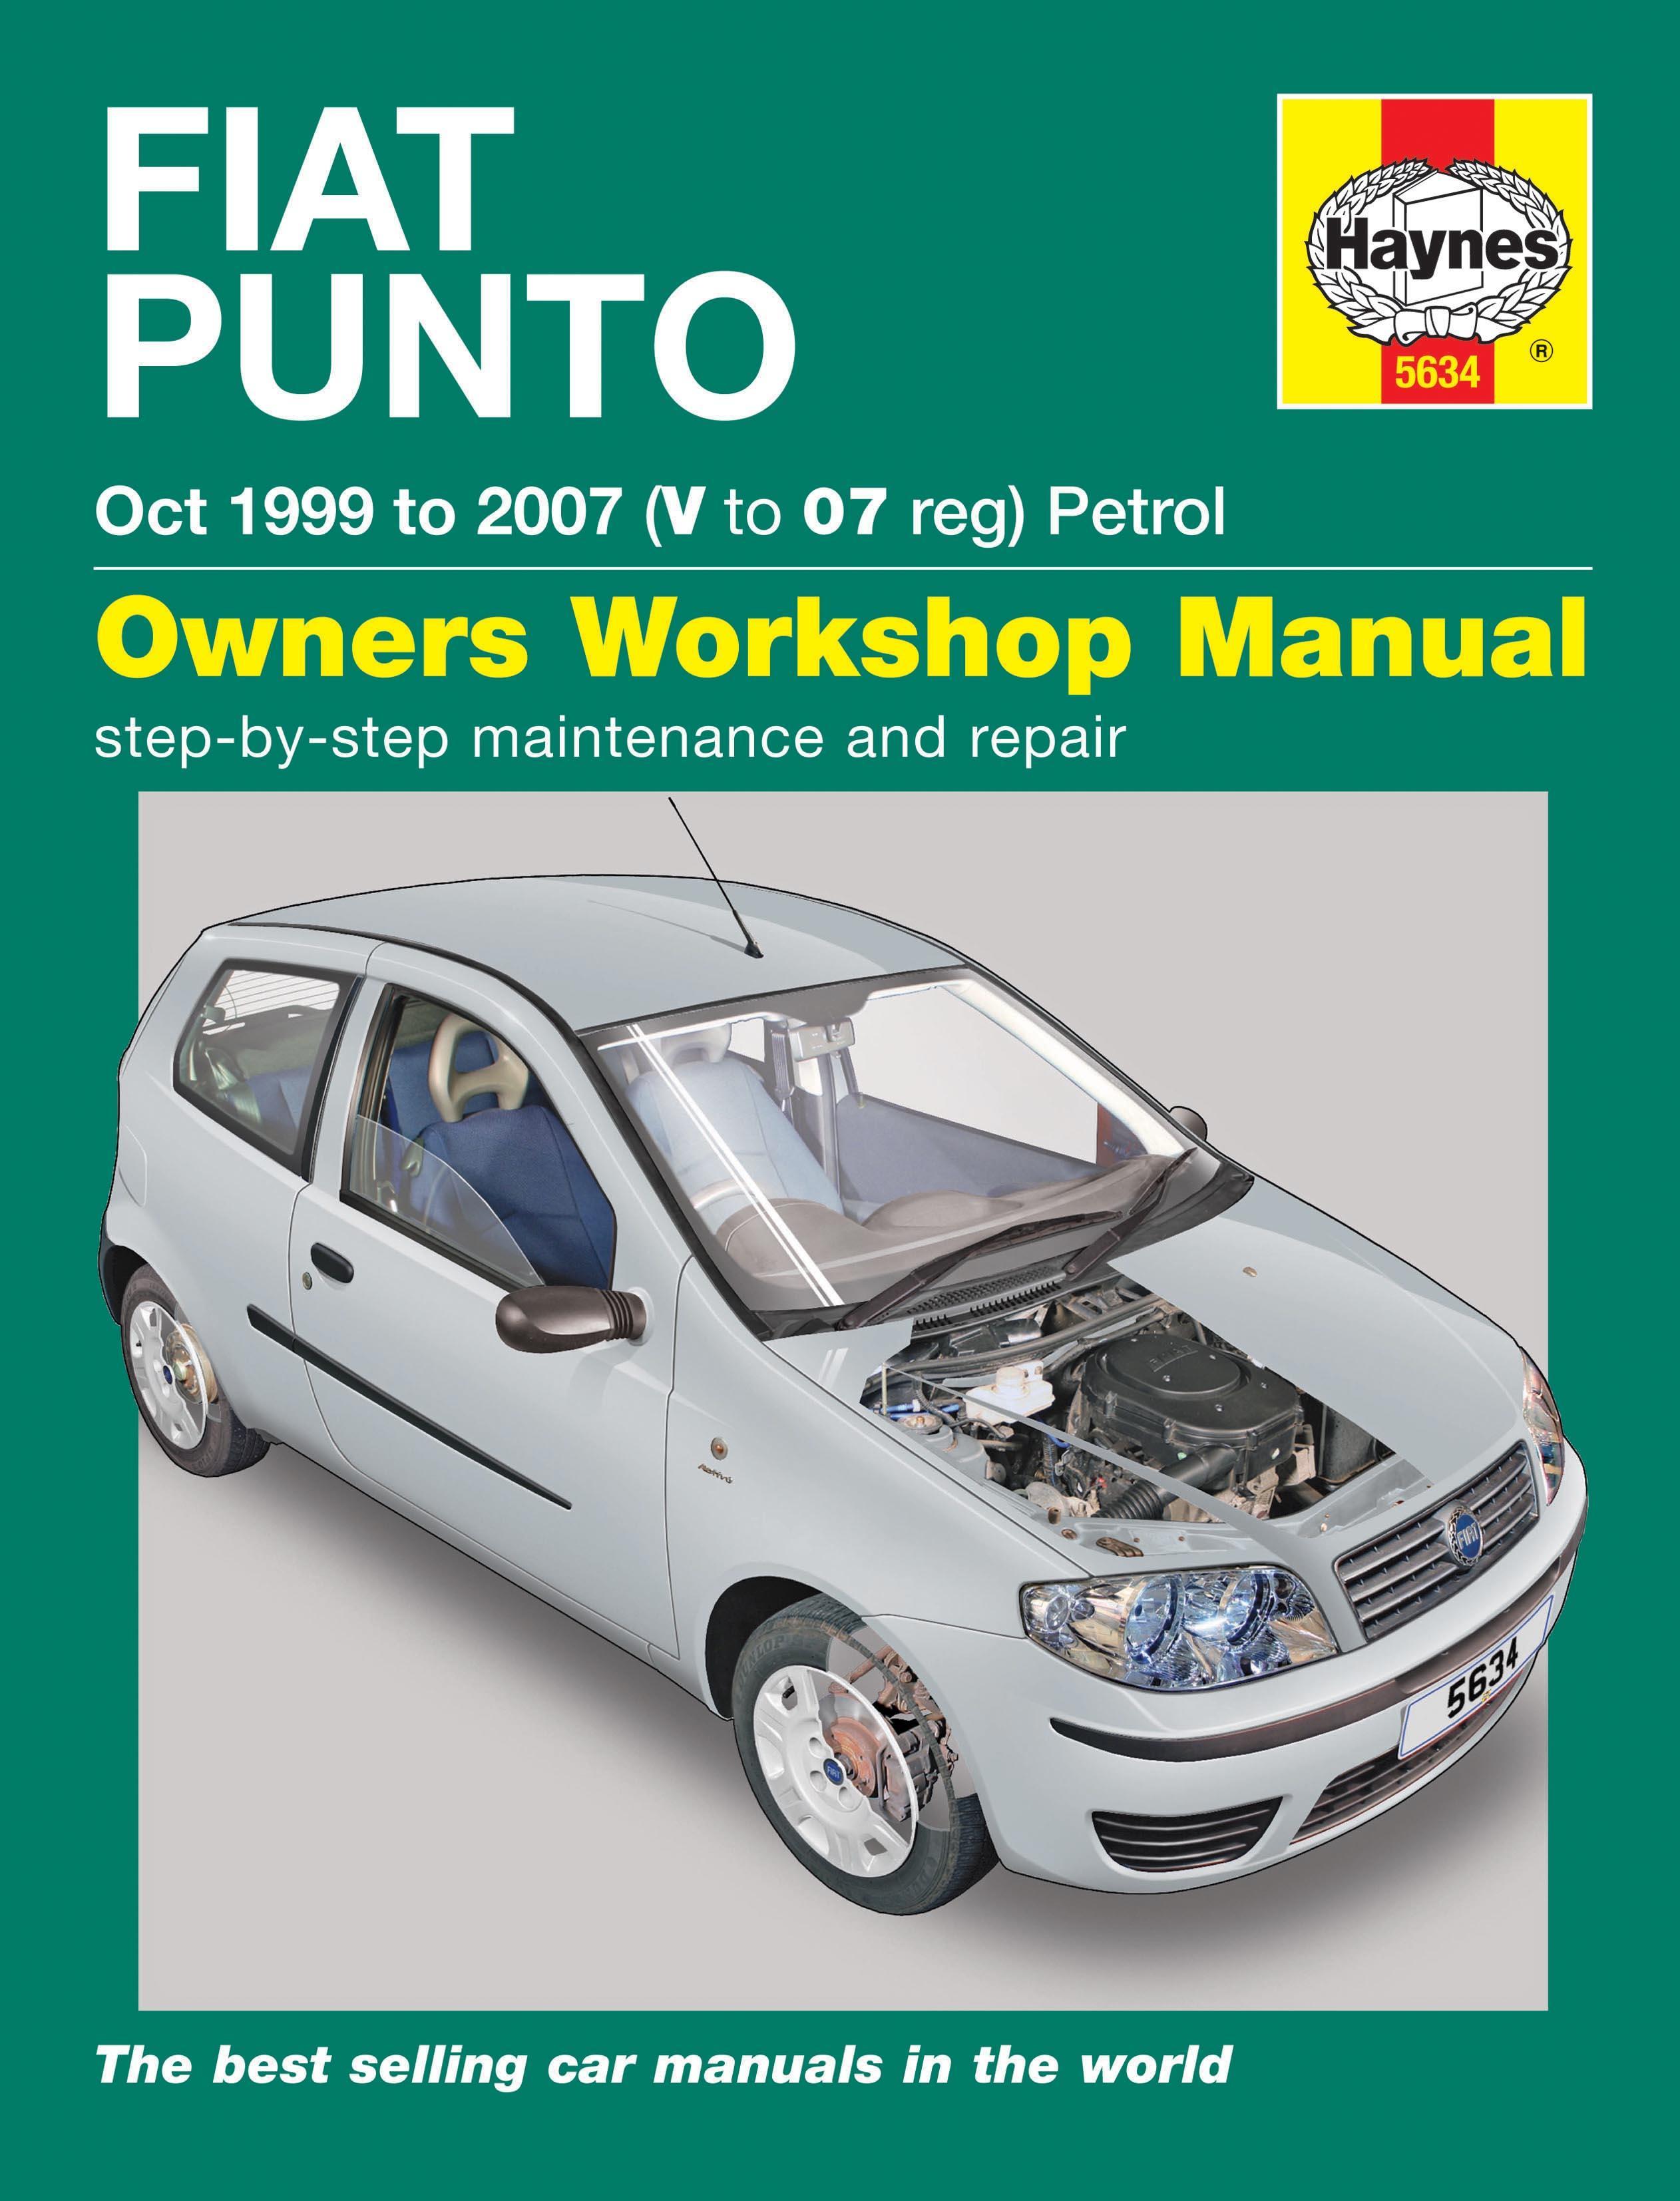 haynes fiat punto petrol 99 07 ma rh halfords com 2004 Fiat Punto Fiat Punto 2001